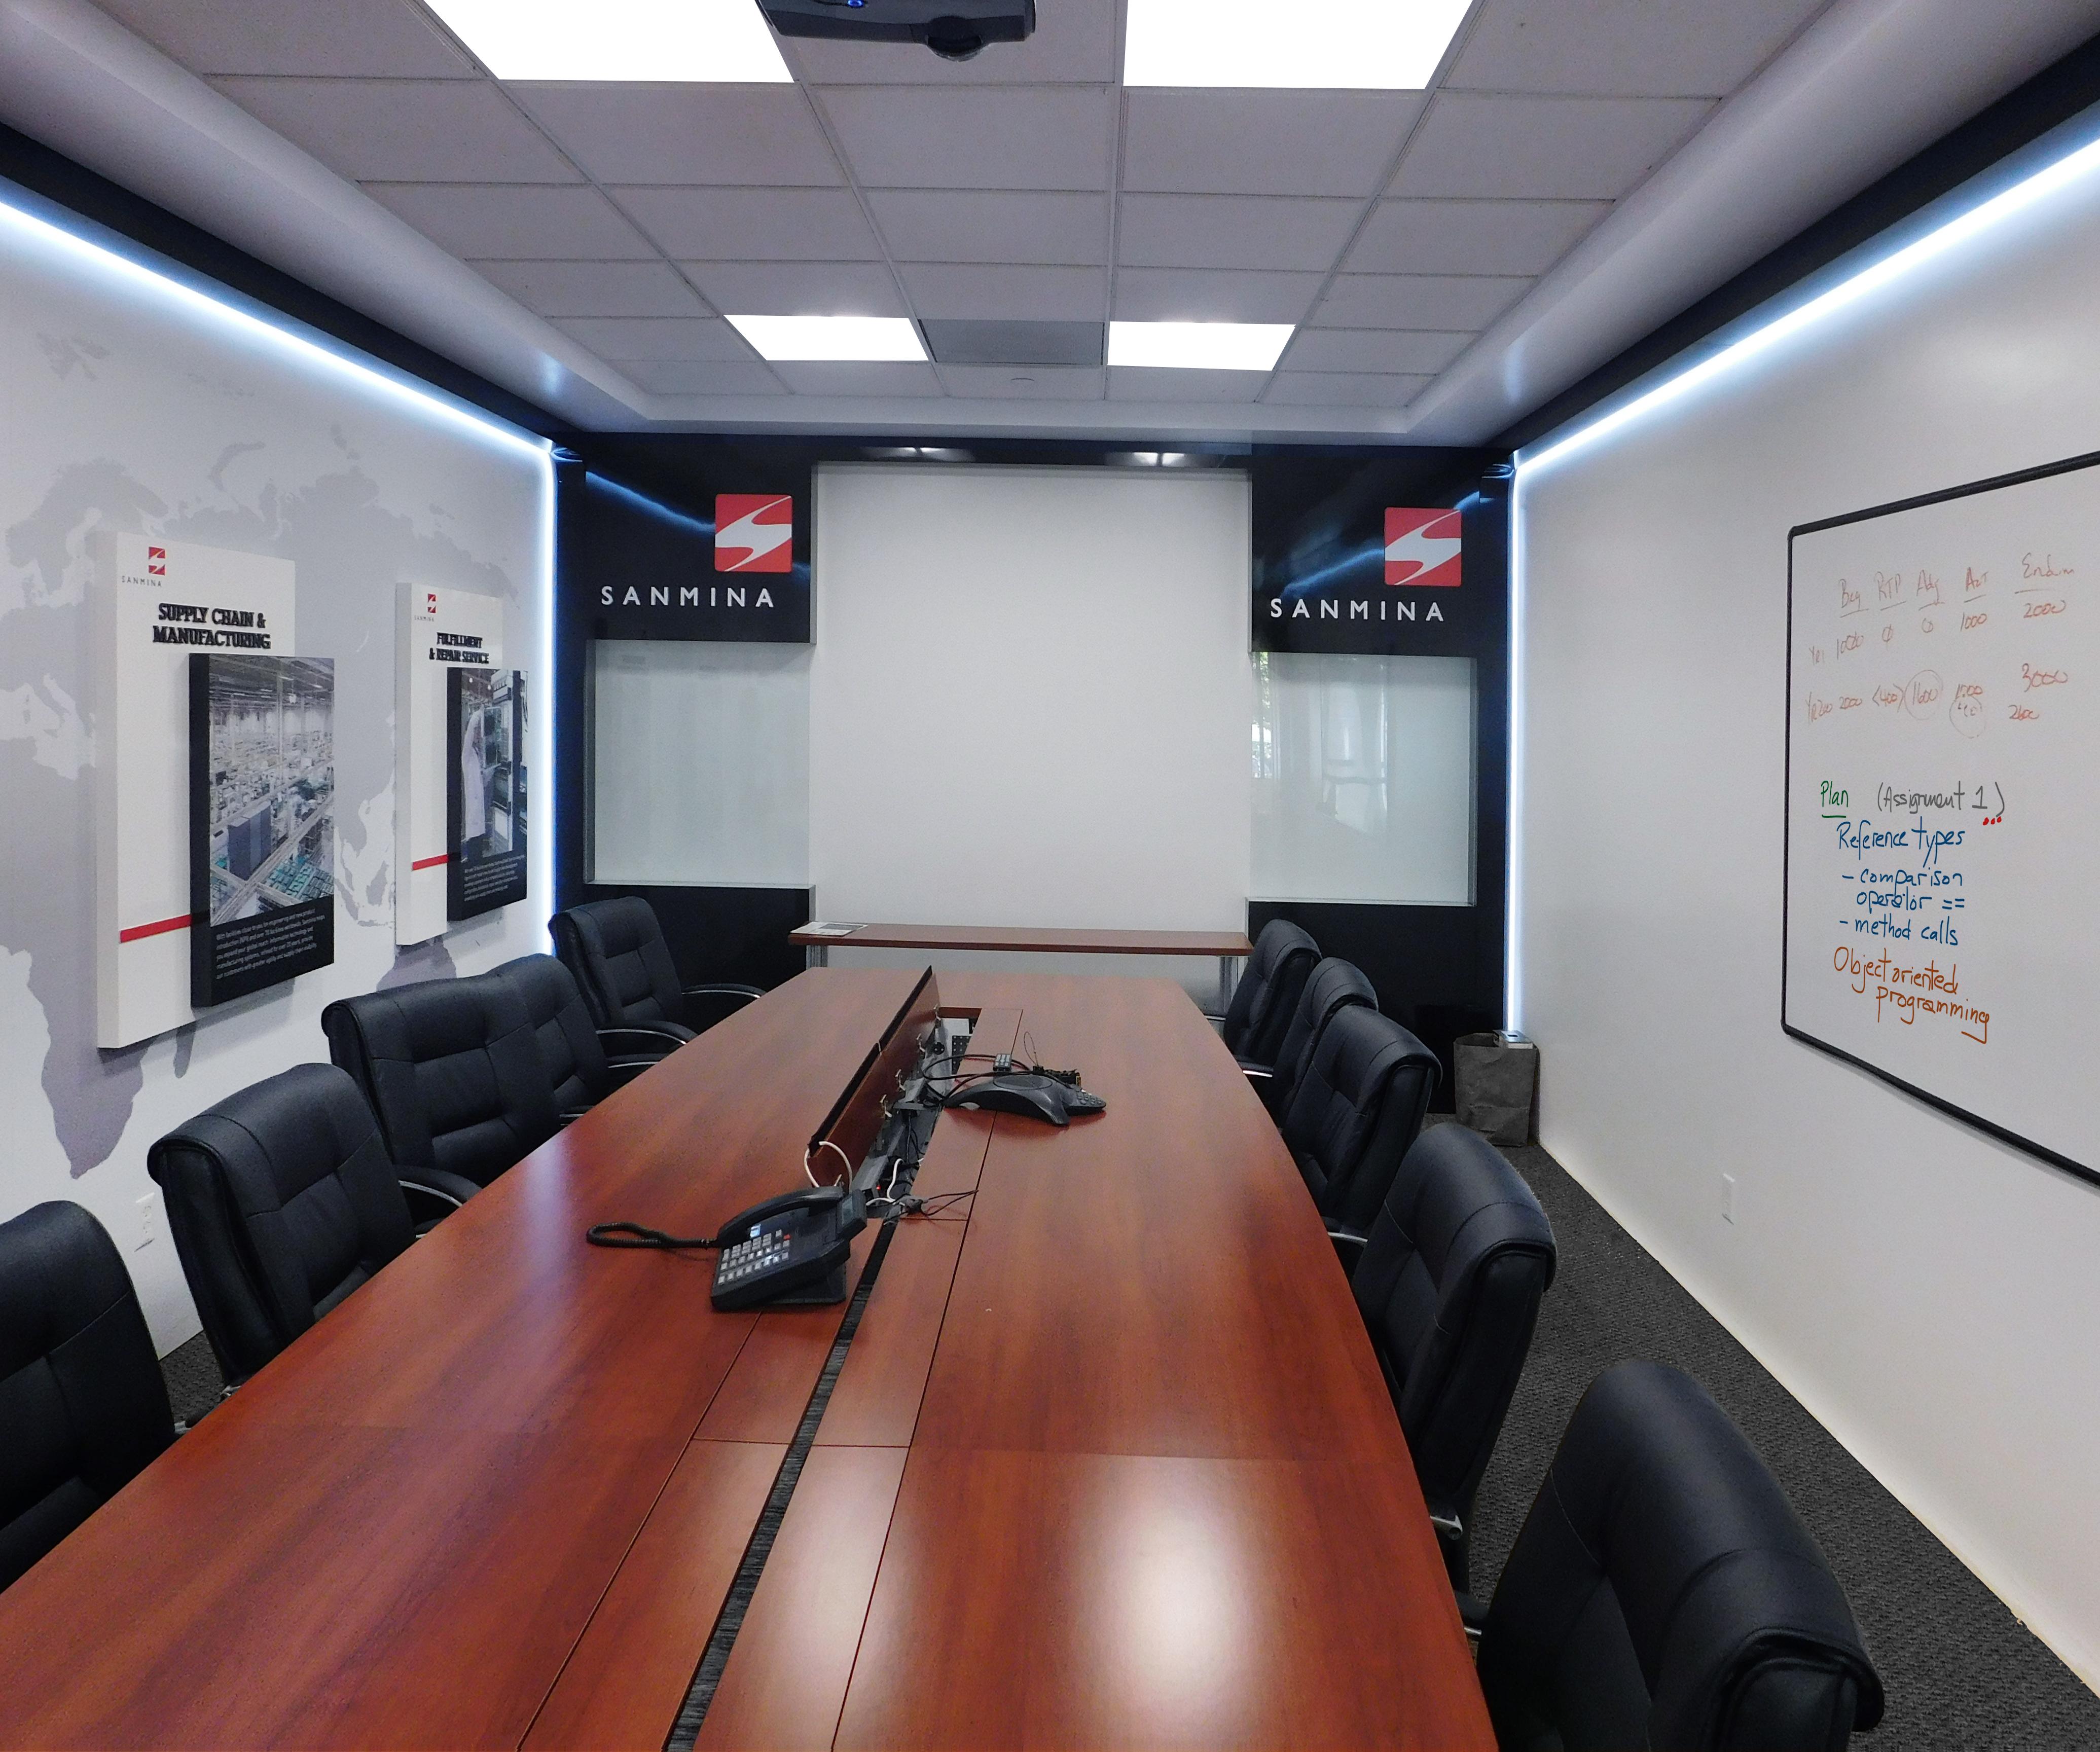 Sanmina Conference Room